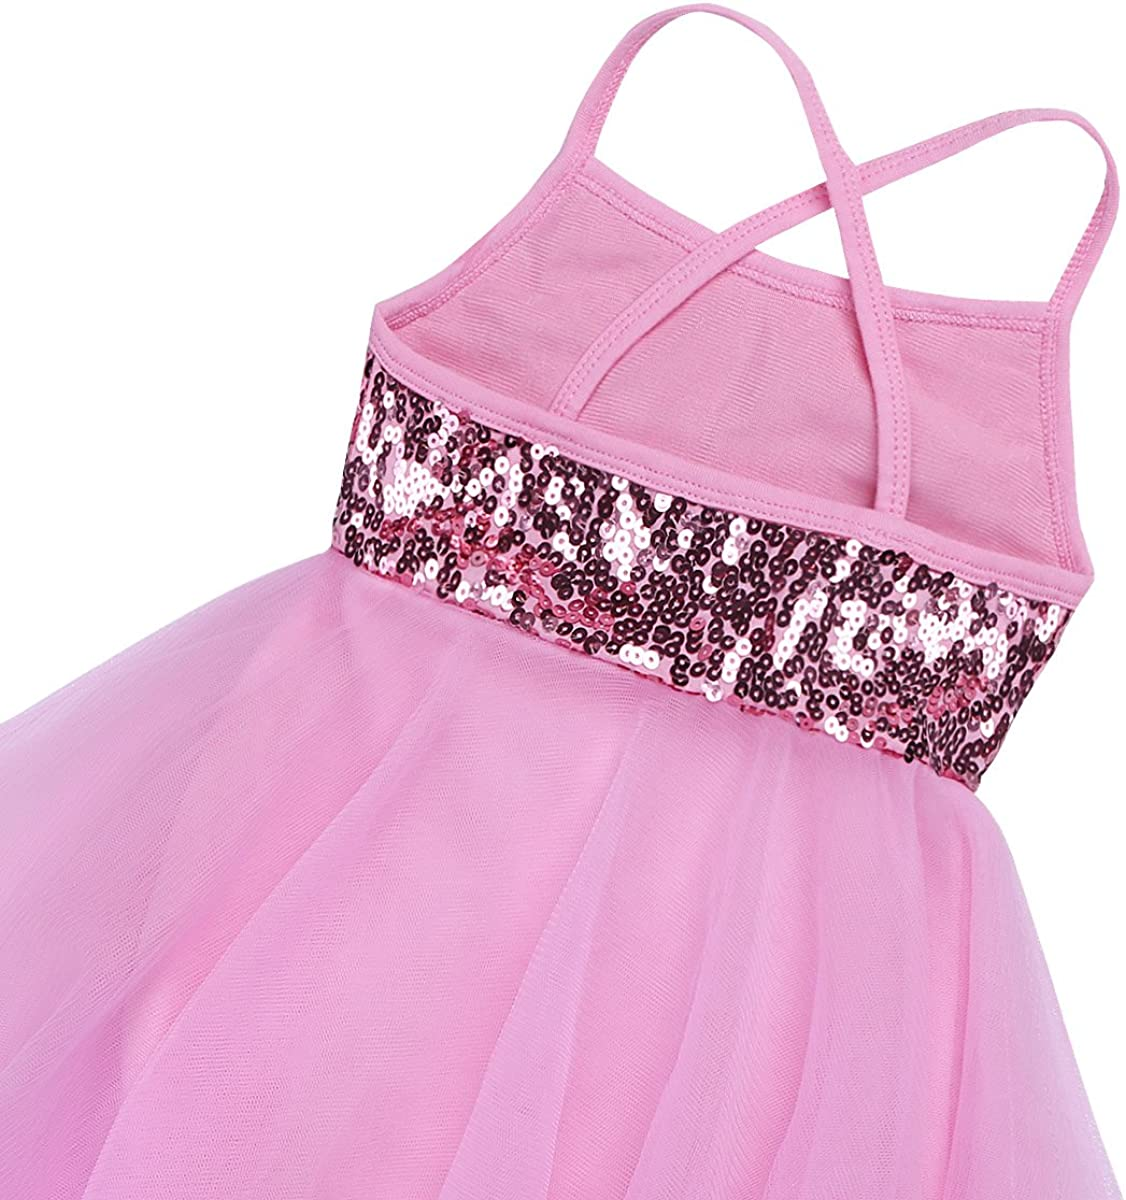 Yartina Kids Girls Shiny Sequin Camisole Ballet Dance Tutu Dress Lyrical Dancing Irregular Skirts Gymnastics Leotard Costume